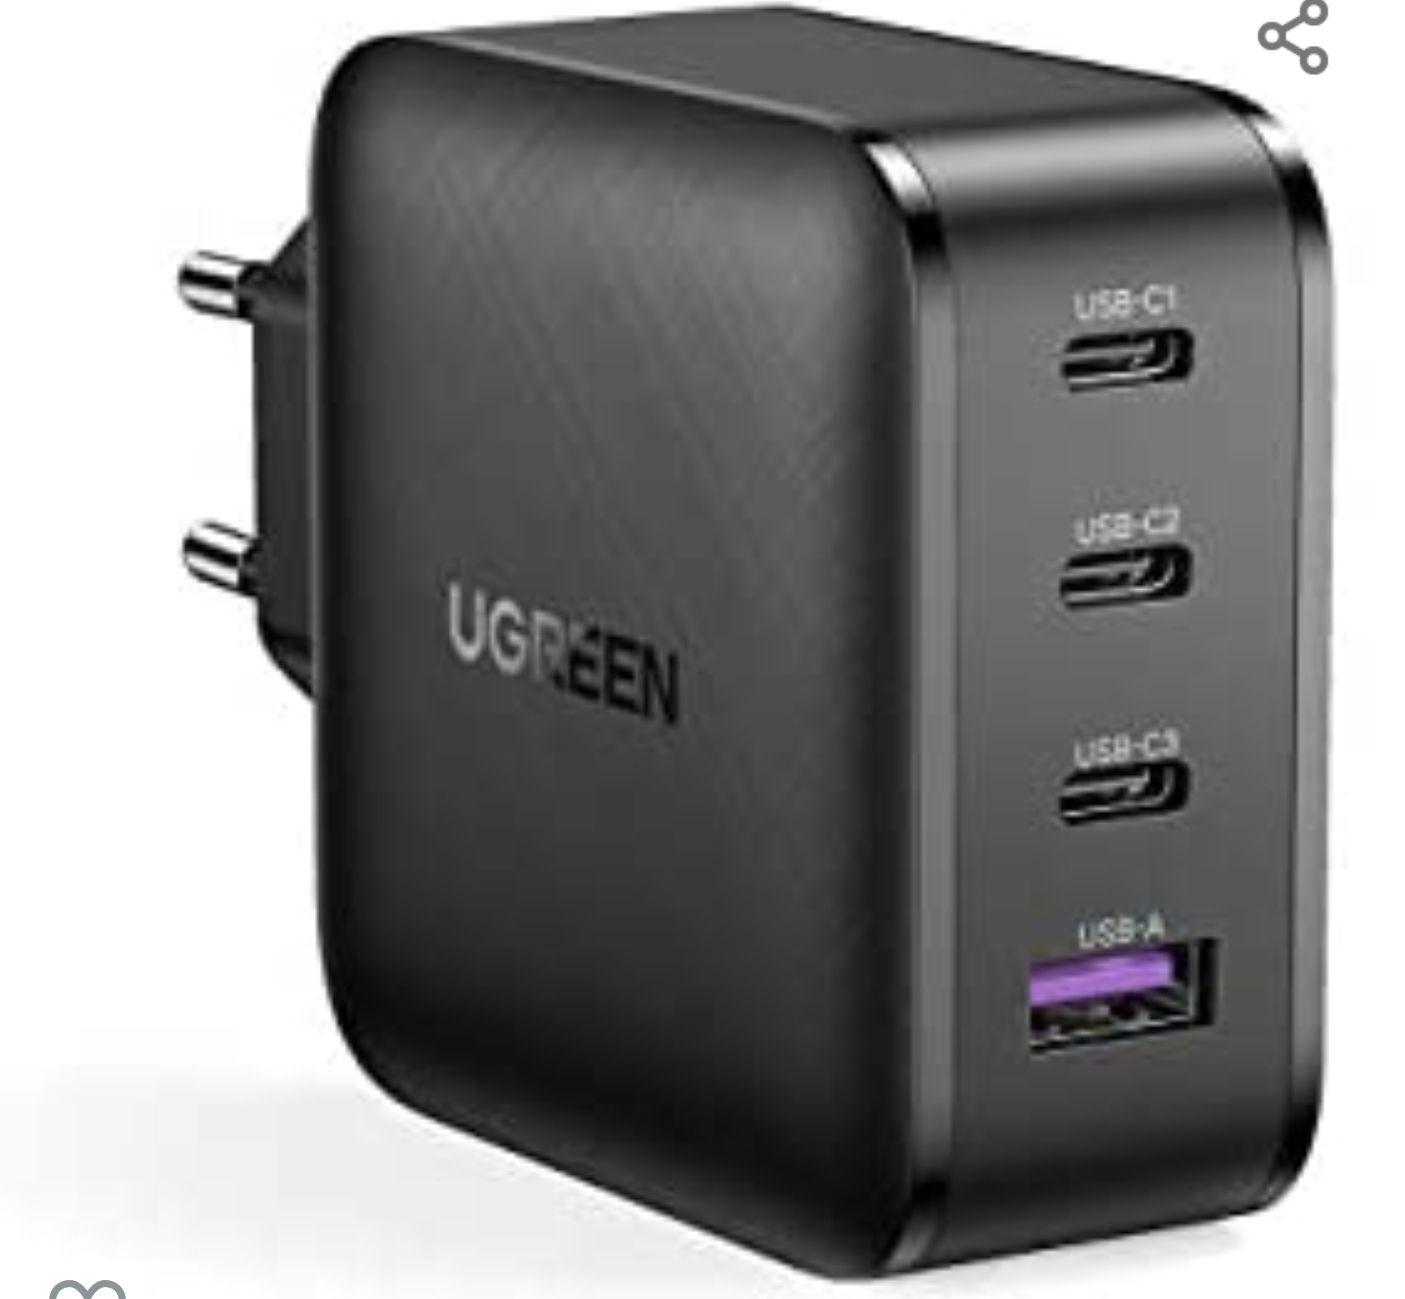 UGREEN USB C Ladegerät 65W Power Delivery mit GaN Tech [Amazon Prime]